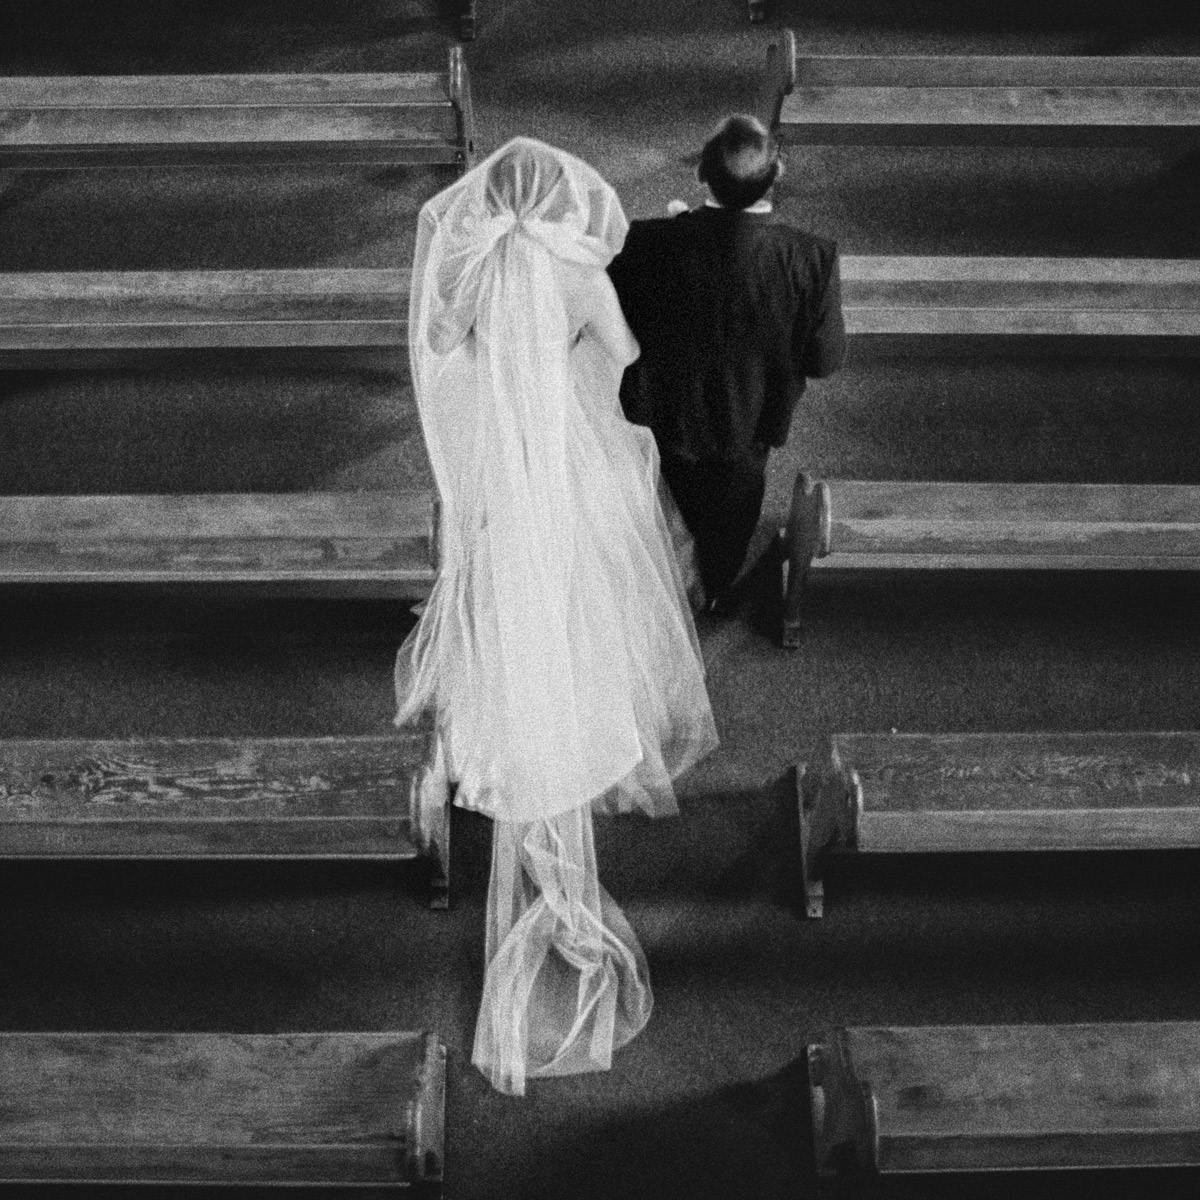 destination_wedding_photography_jonas_peterson015